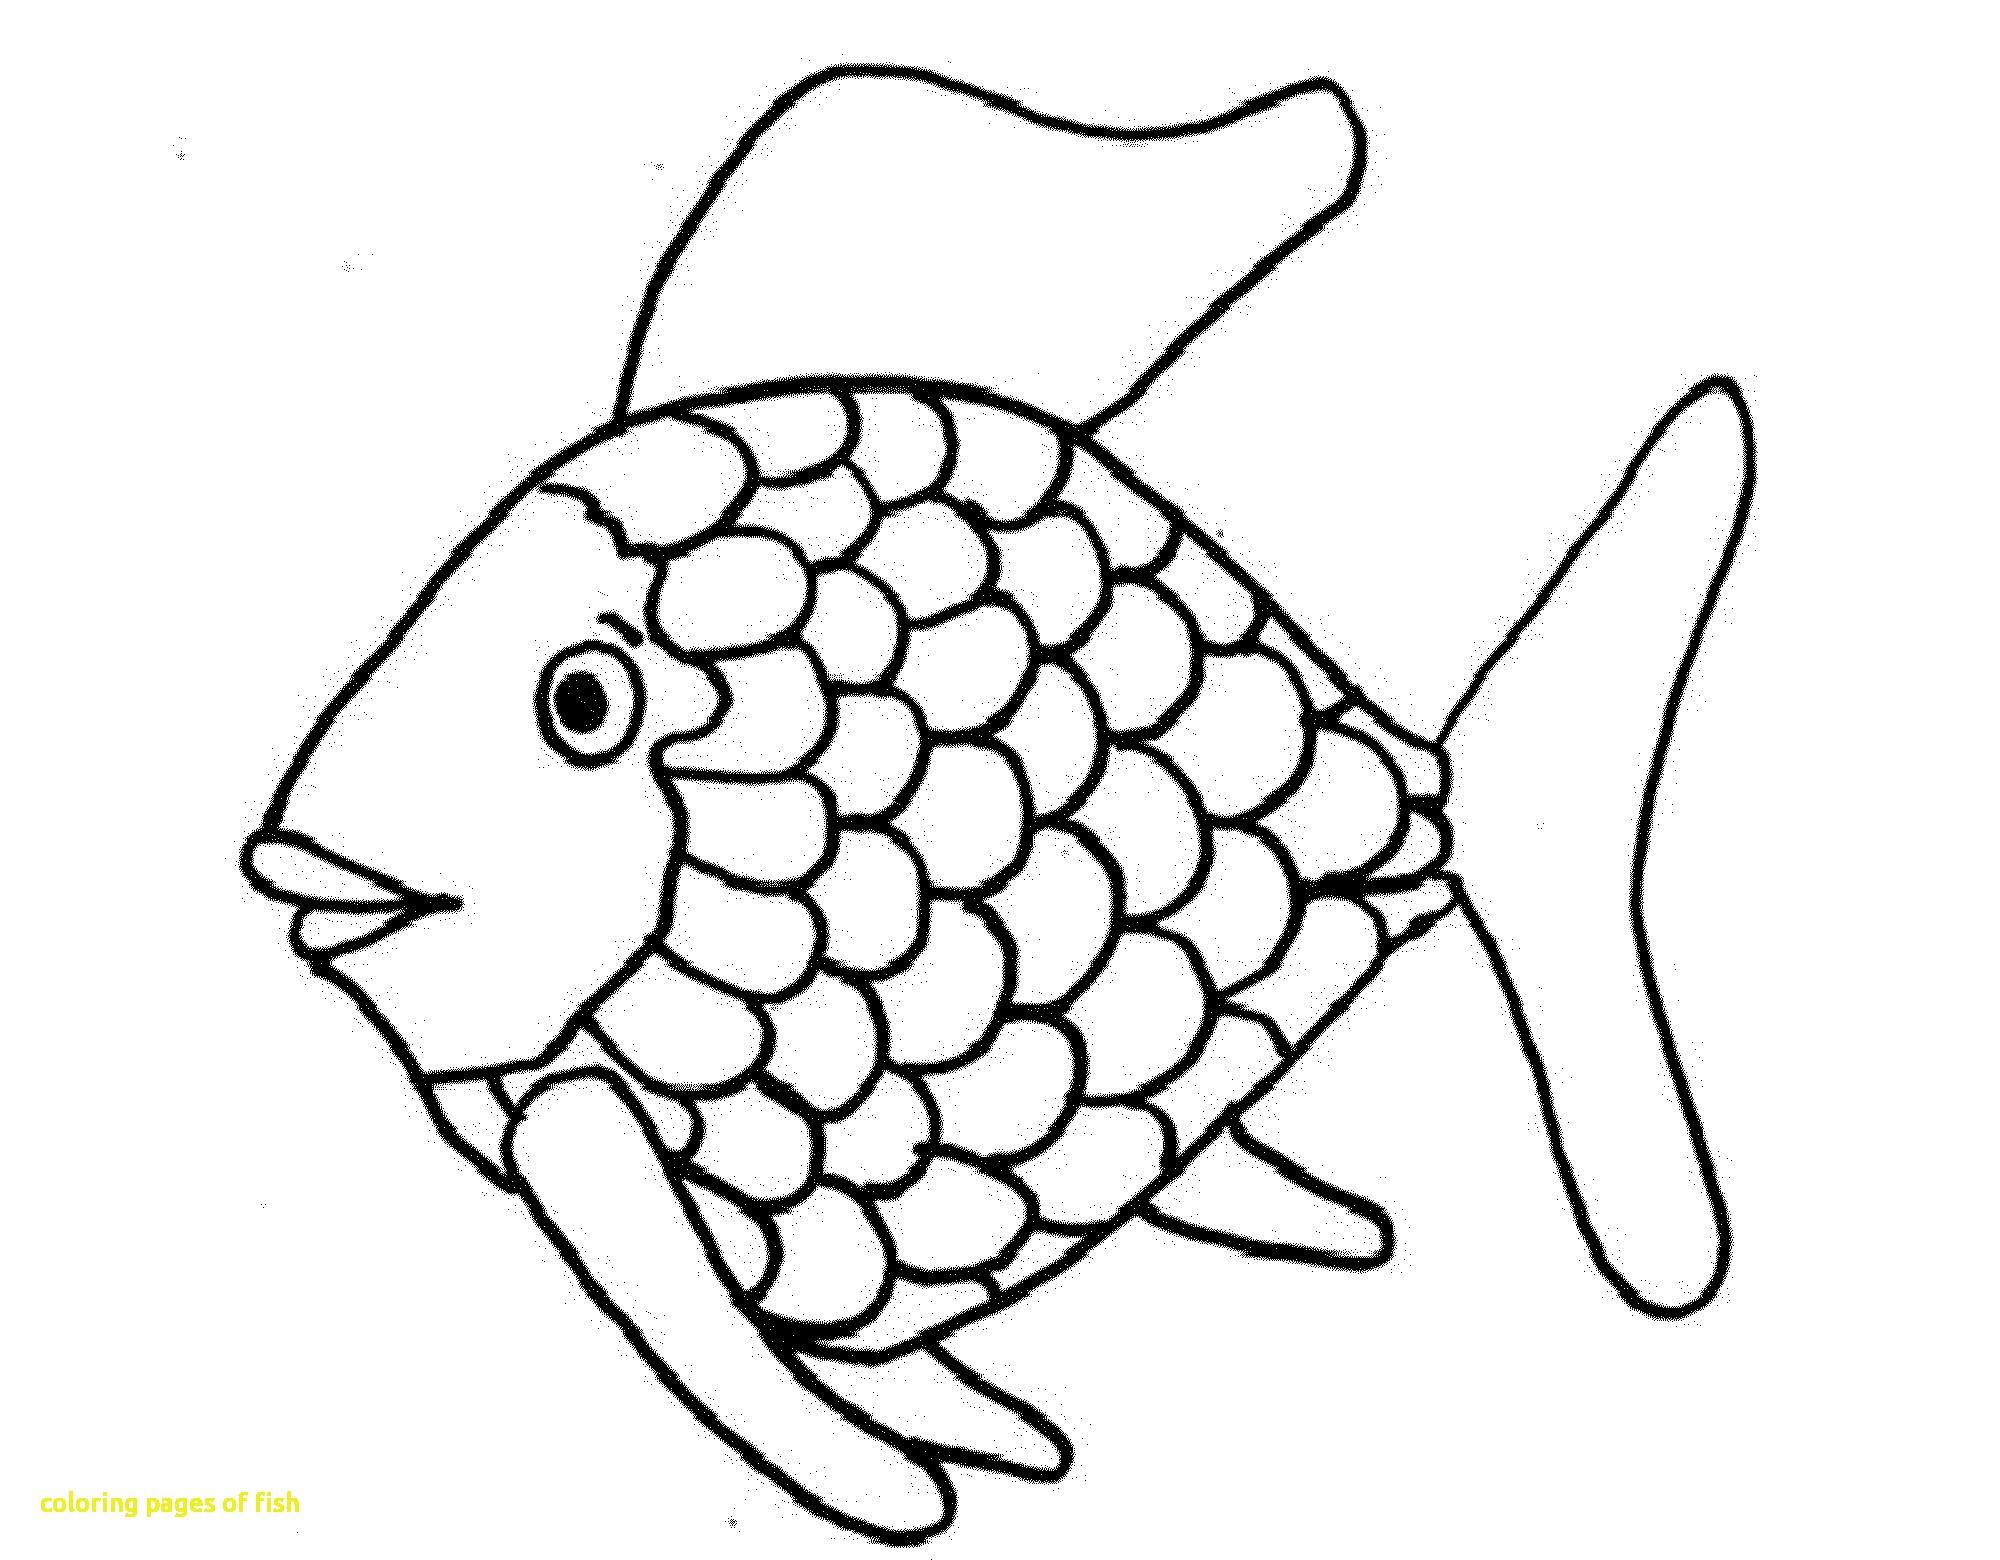 2000x1560 Fish Color Pages